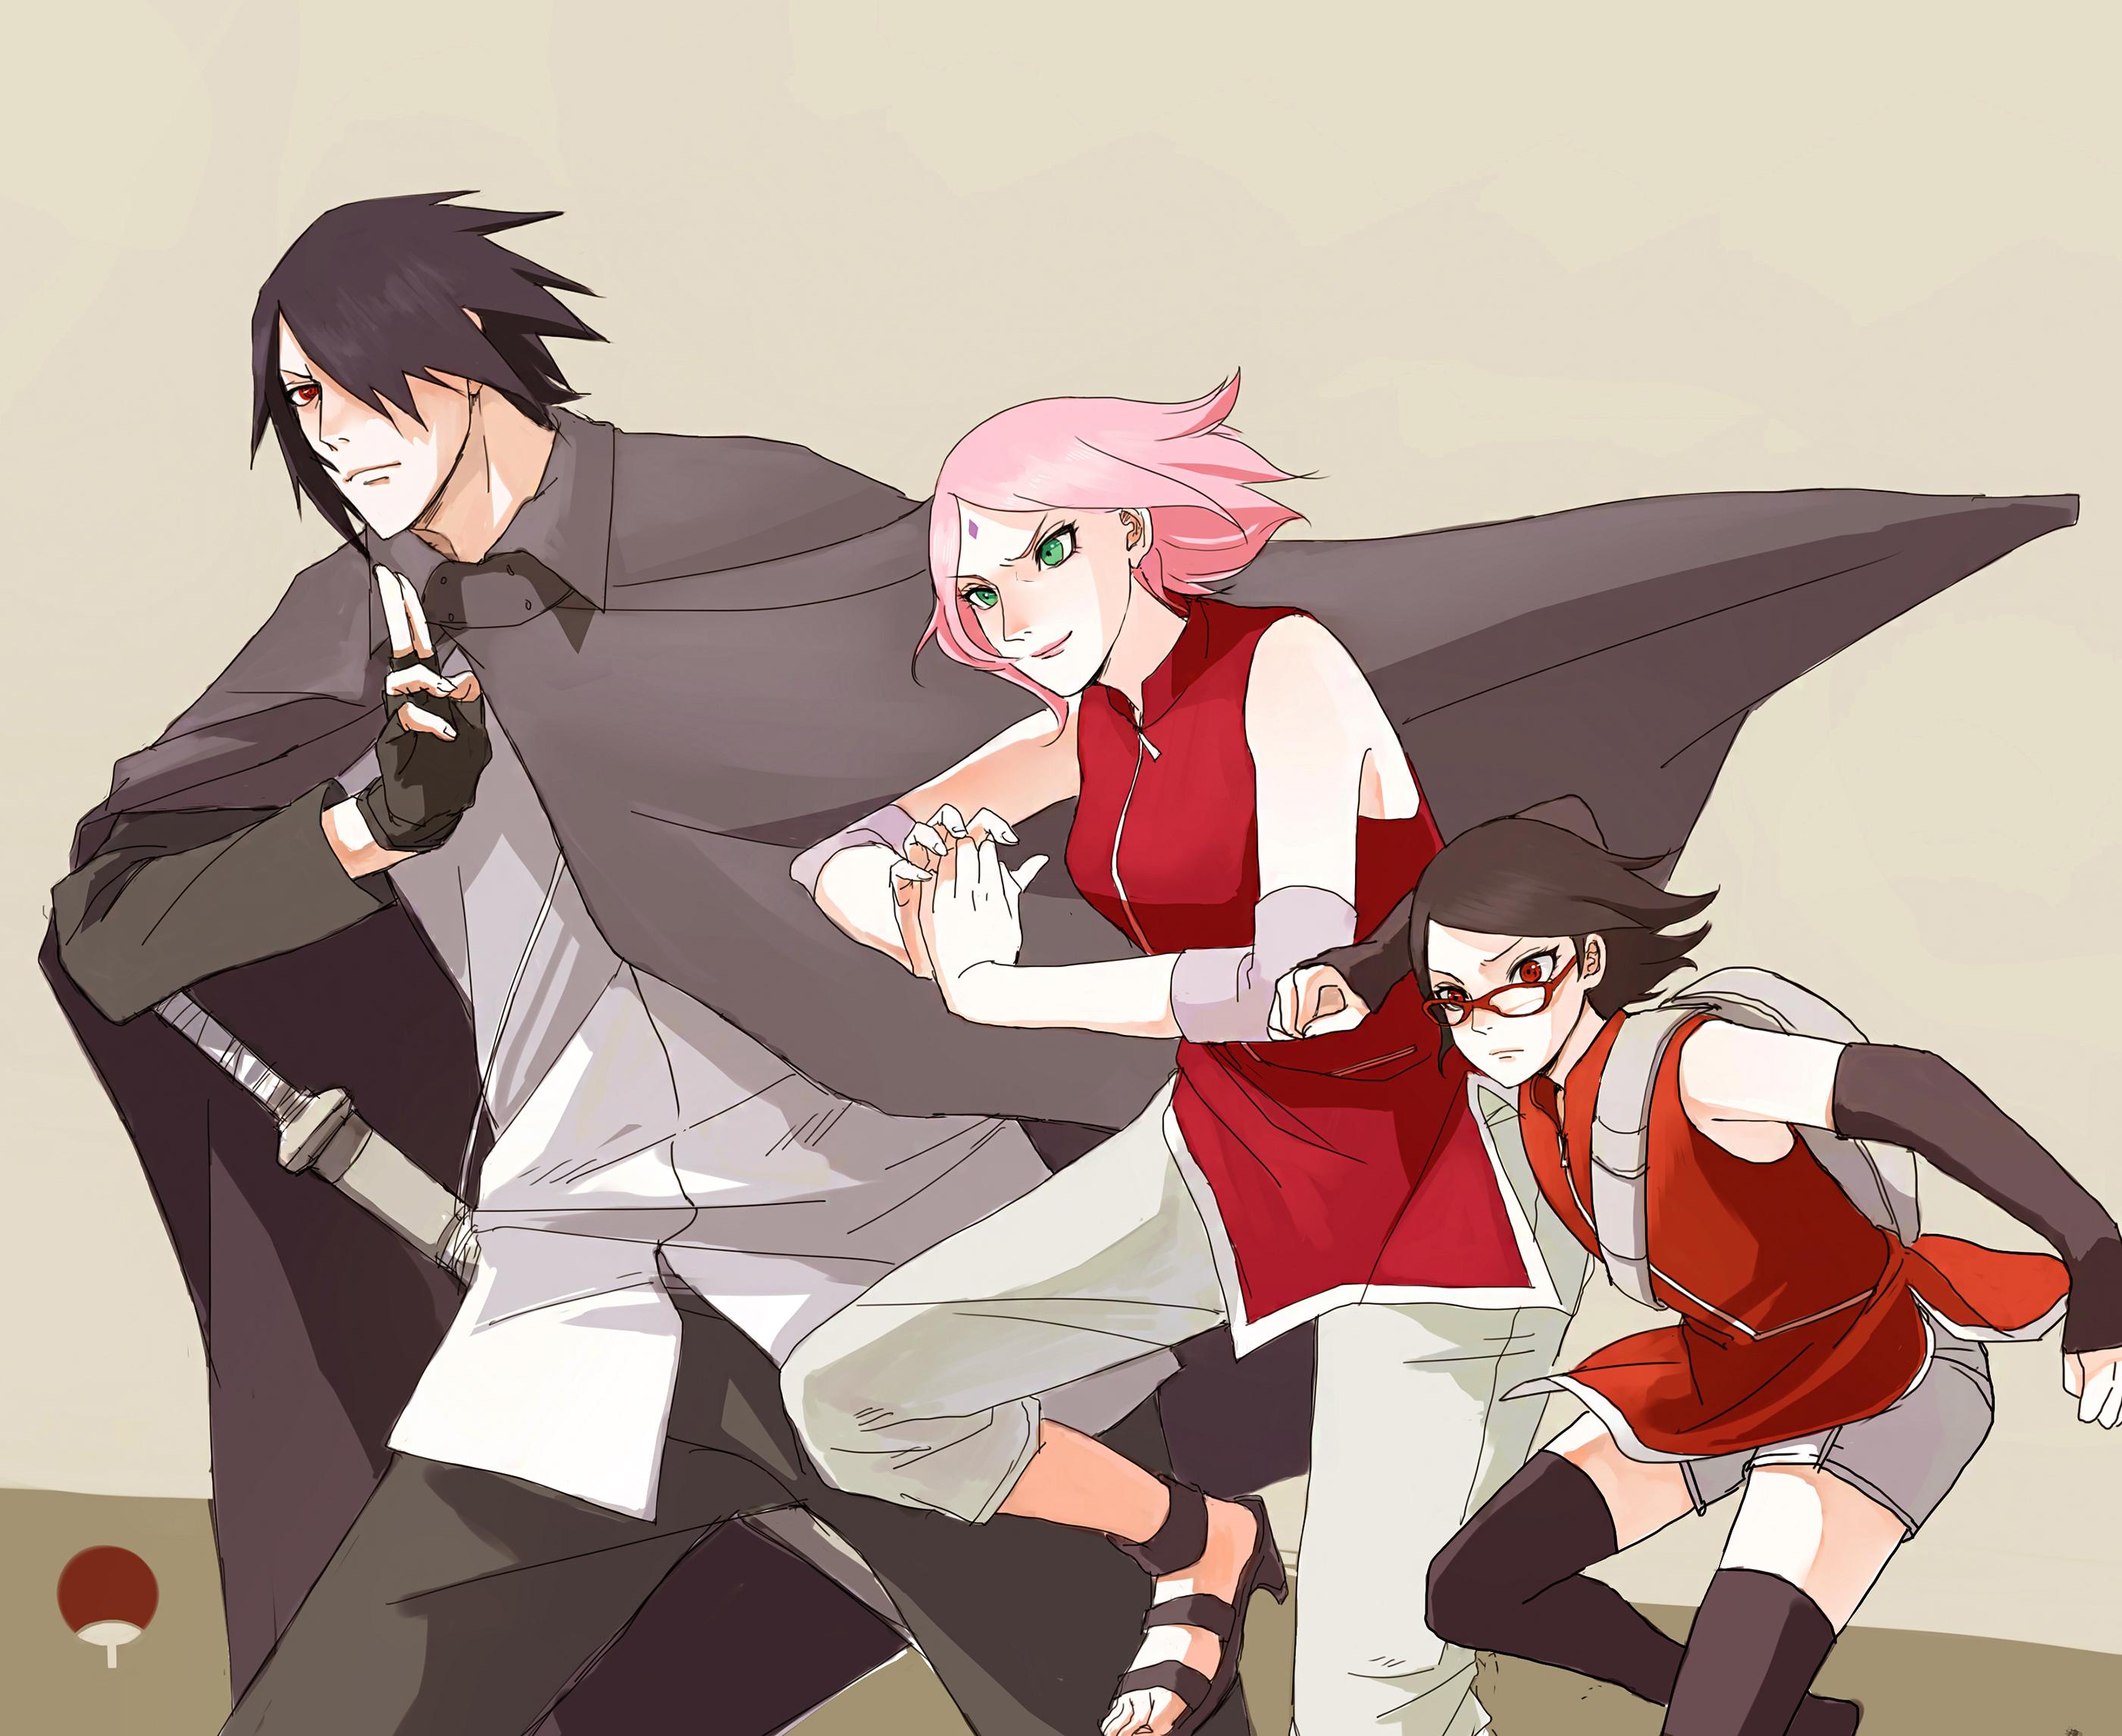 Sasuke And Sakura Wallpapers Hd Labzada Wallpaper